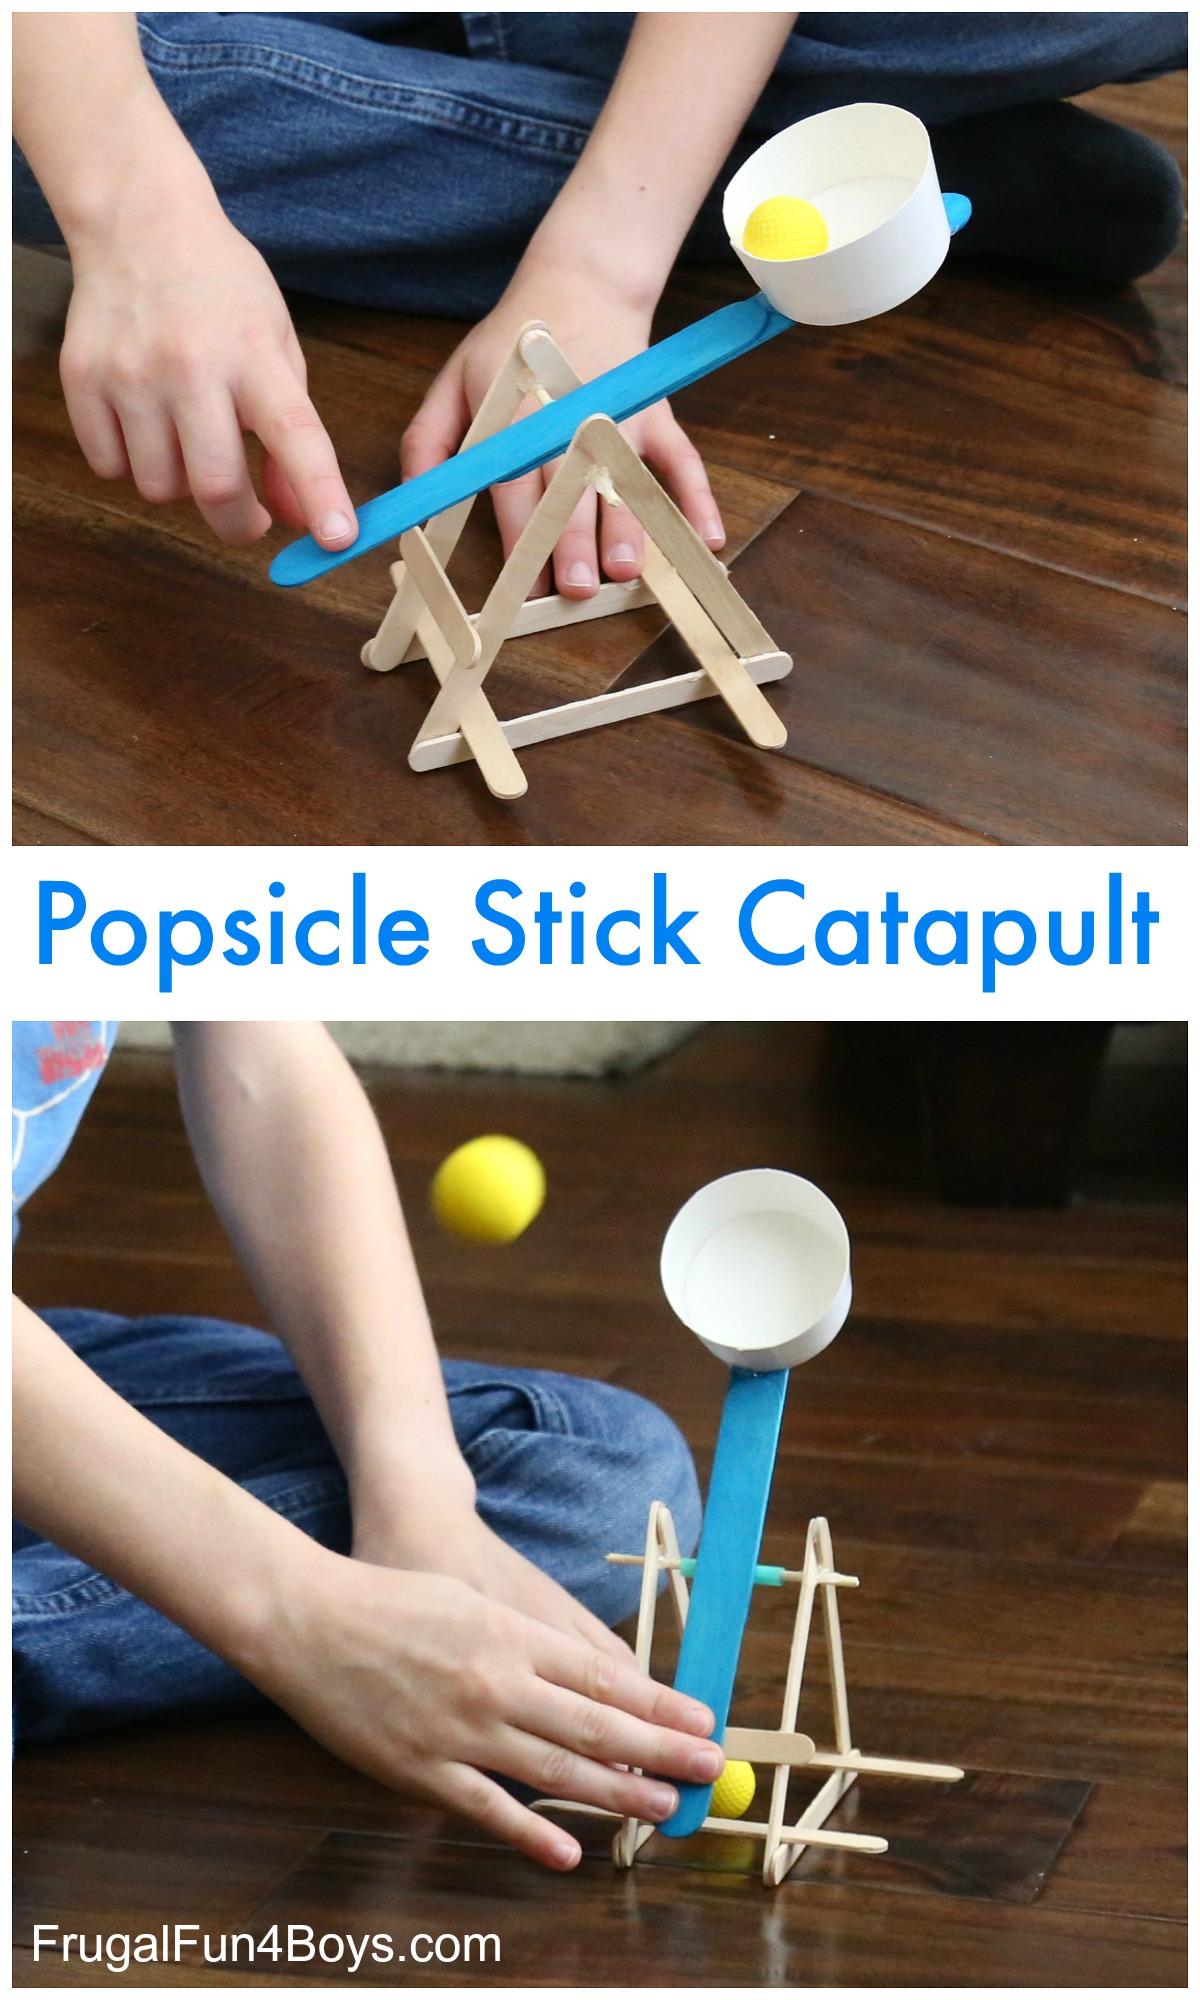 Popsicle Stick Catapult